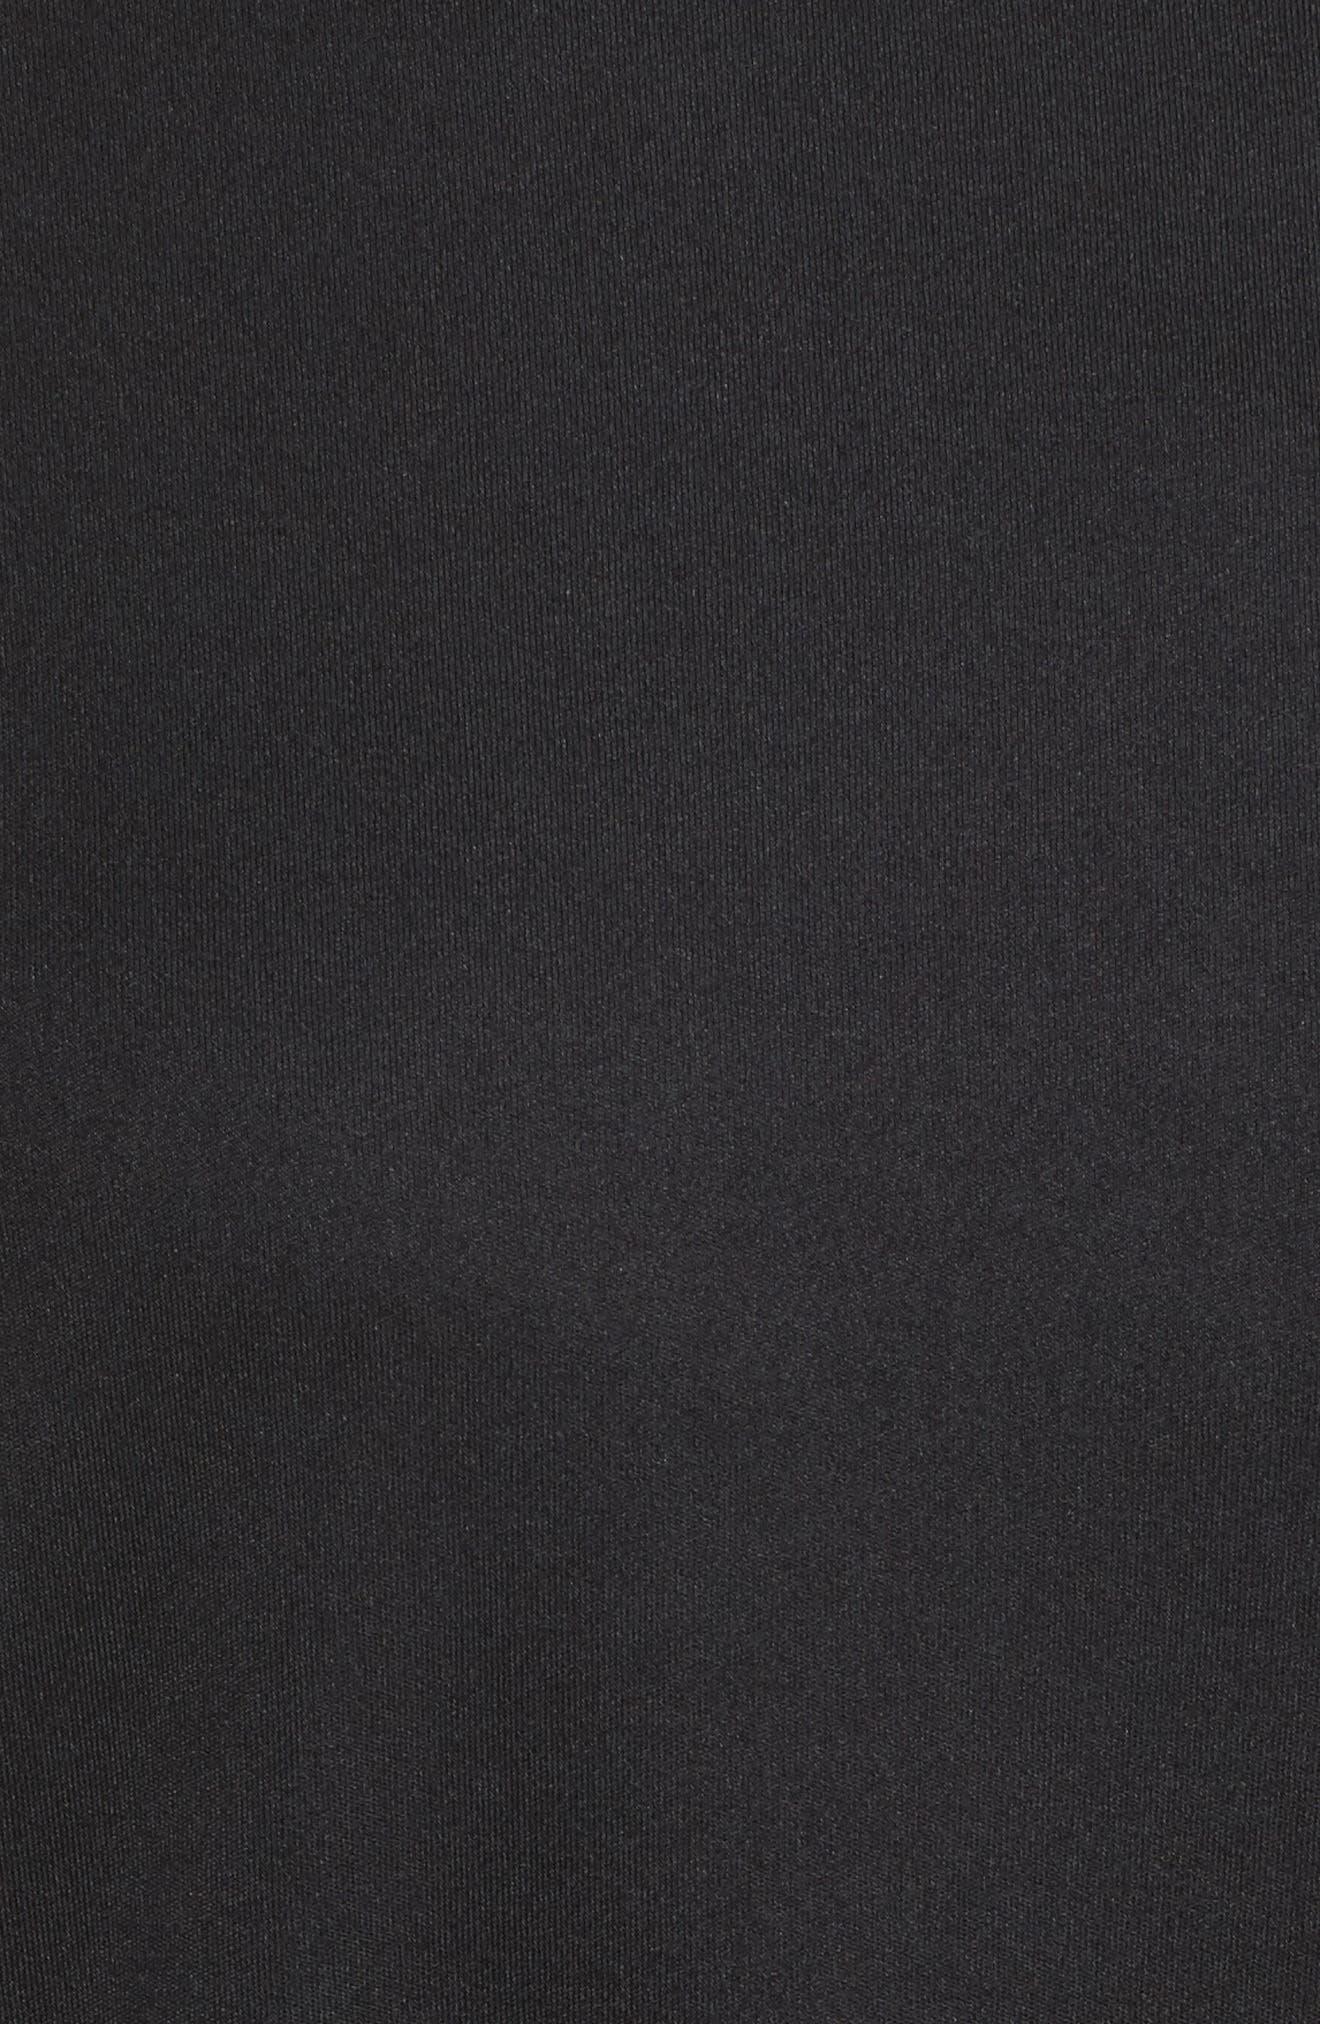 Miler Dry Long Sleeve Tee,                             Alternate thumbnail 6, color,                             Black